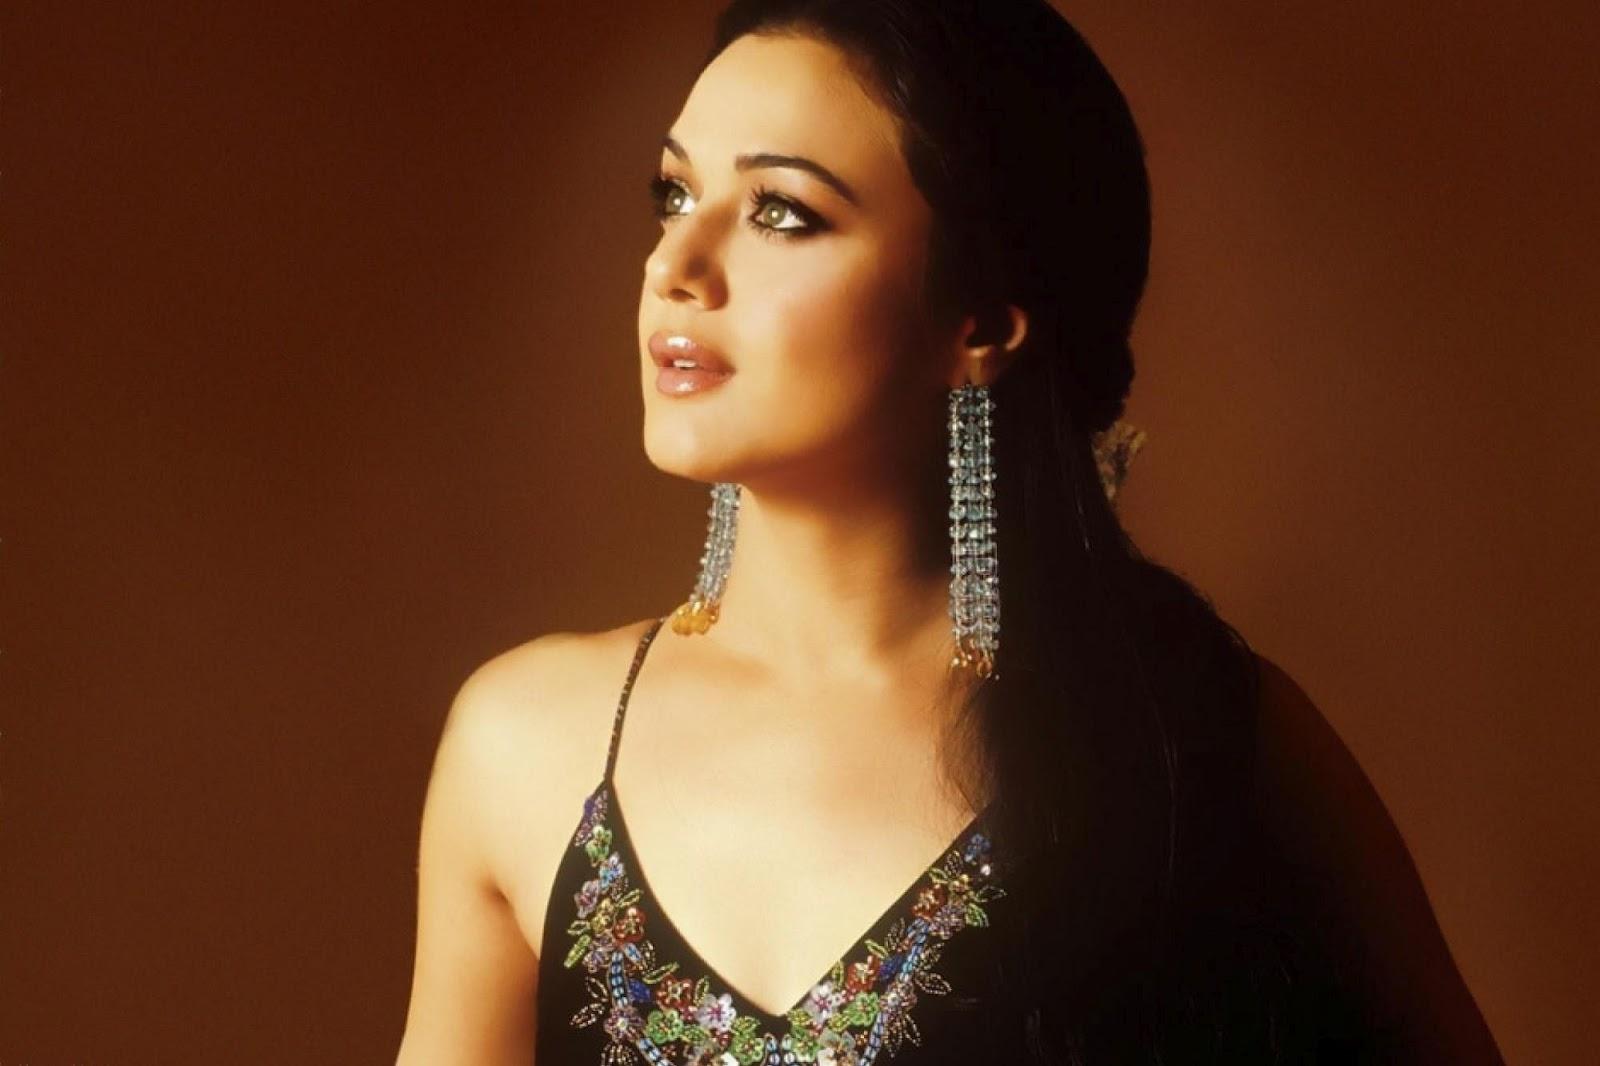 Preity Zinta HD Wallpapers Free Download